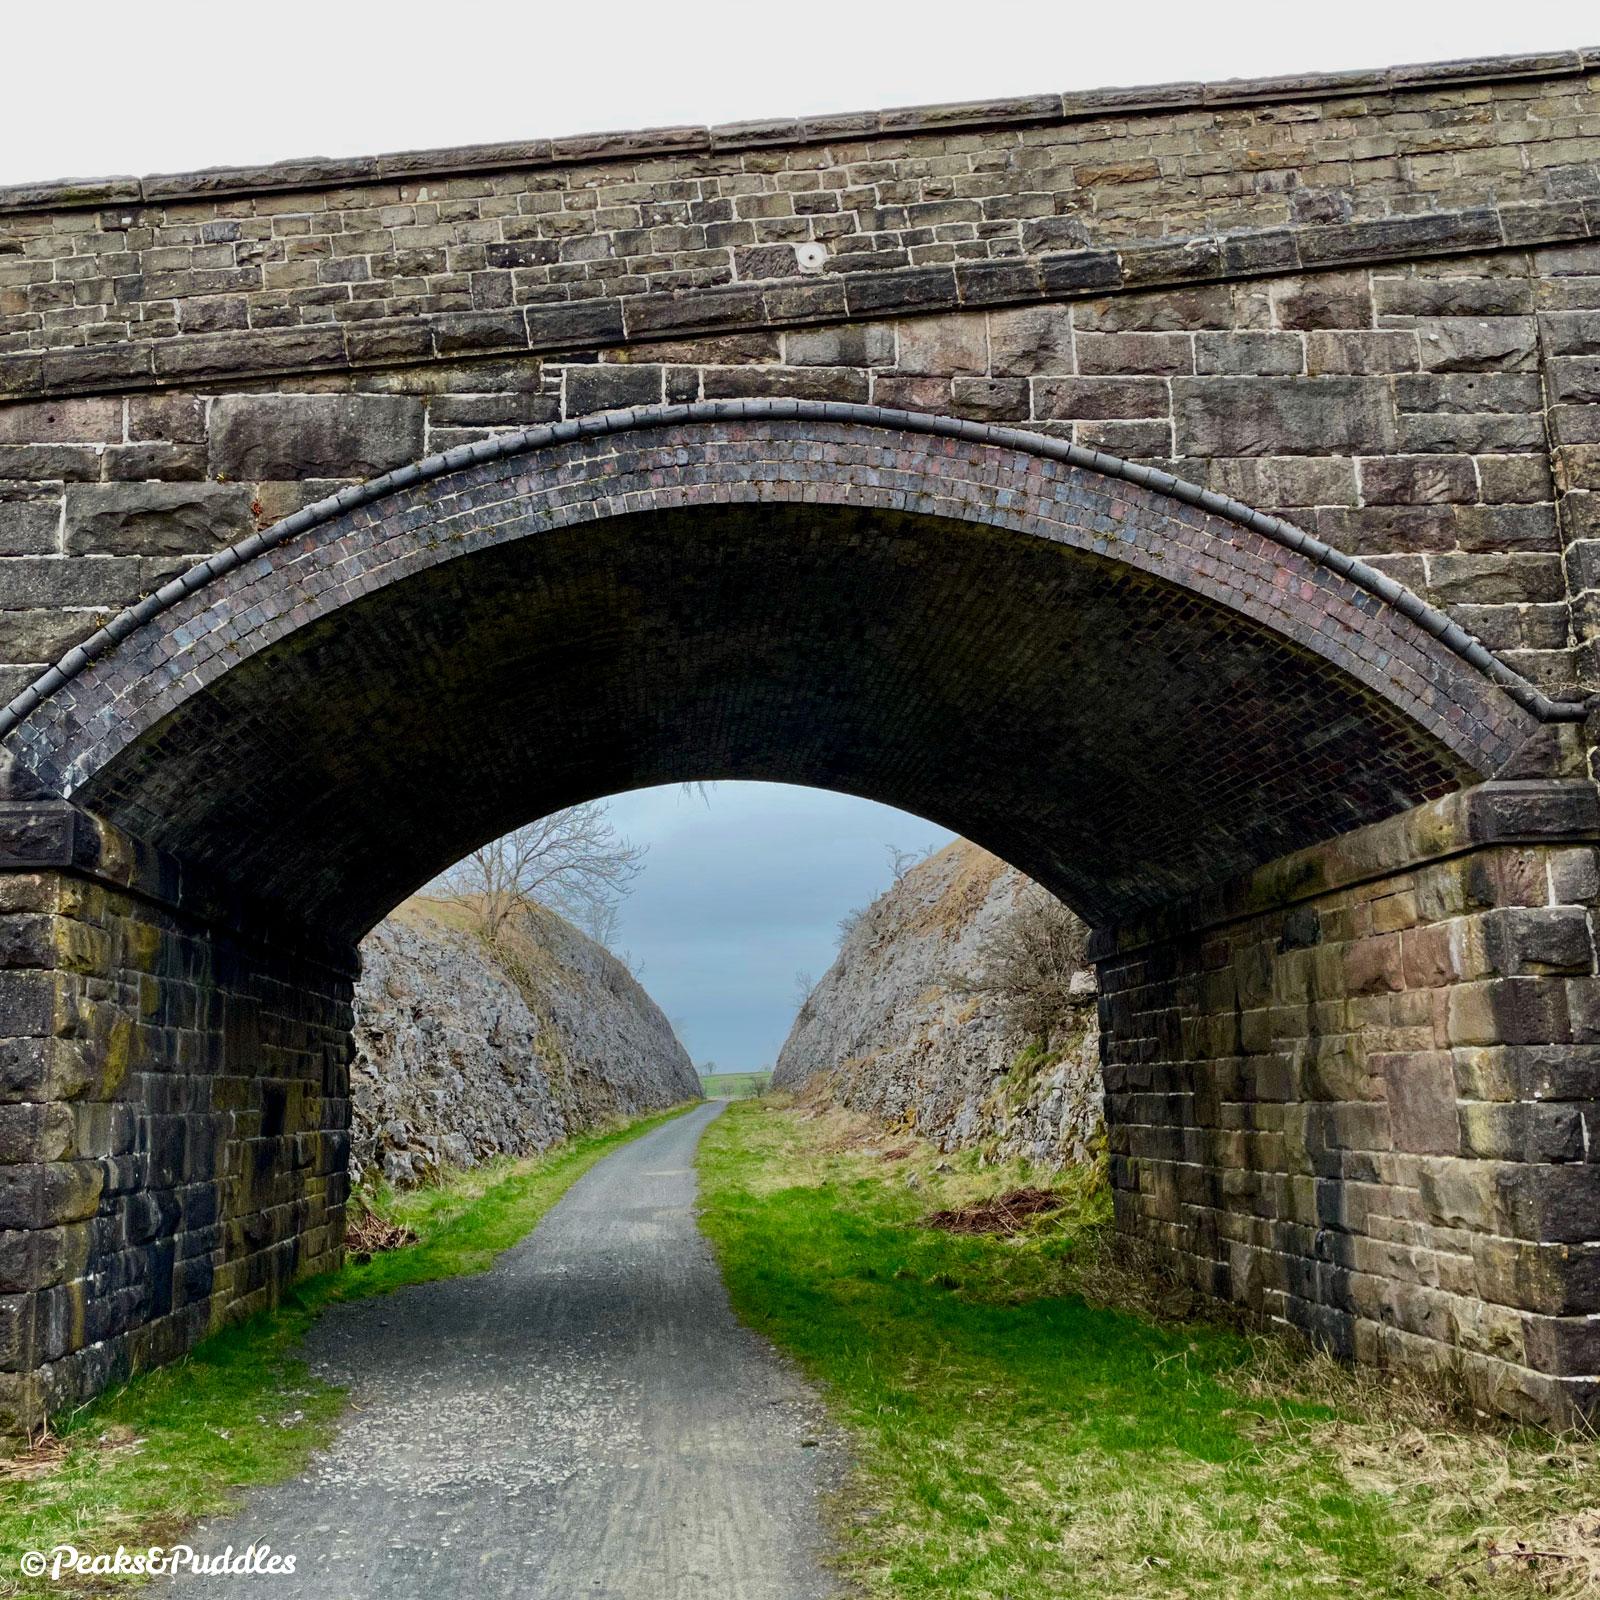 Returning to Parsley Hay, the accommodation bridge frames the railway's deep rock cutting.